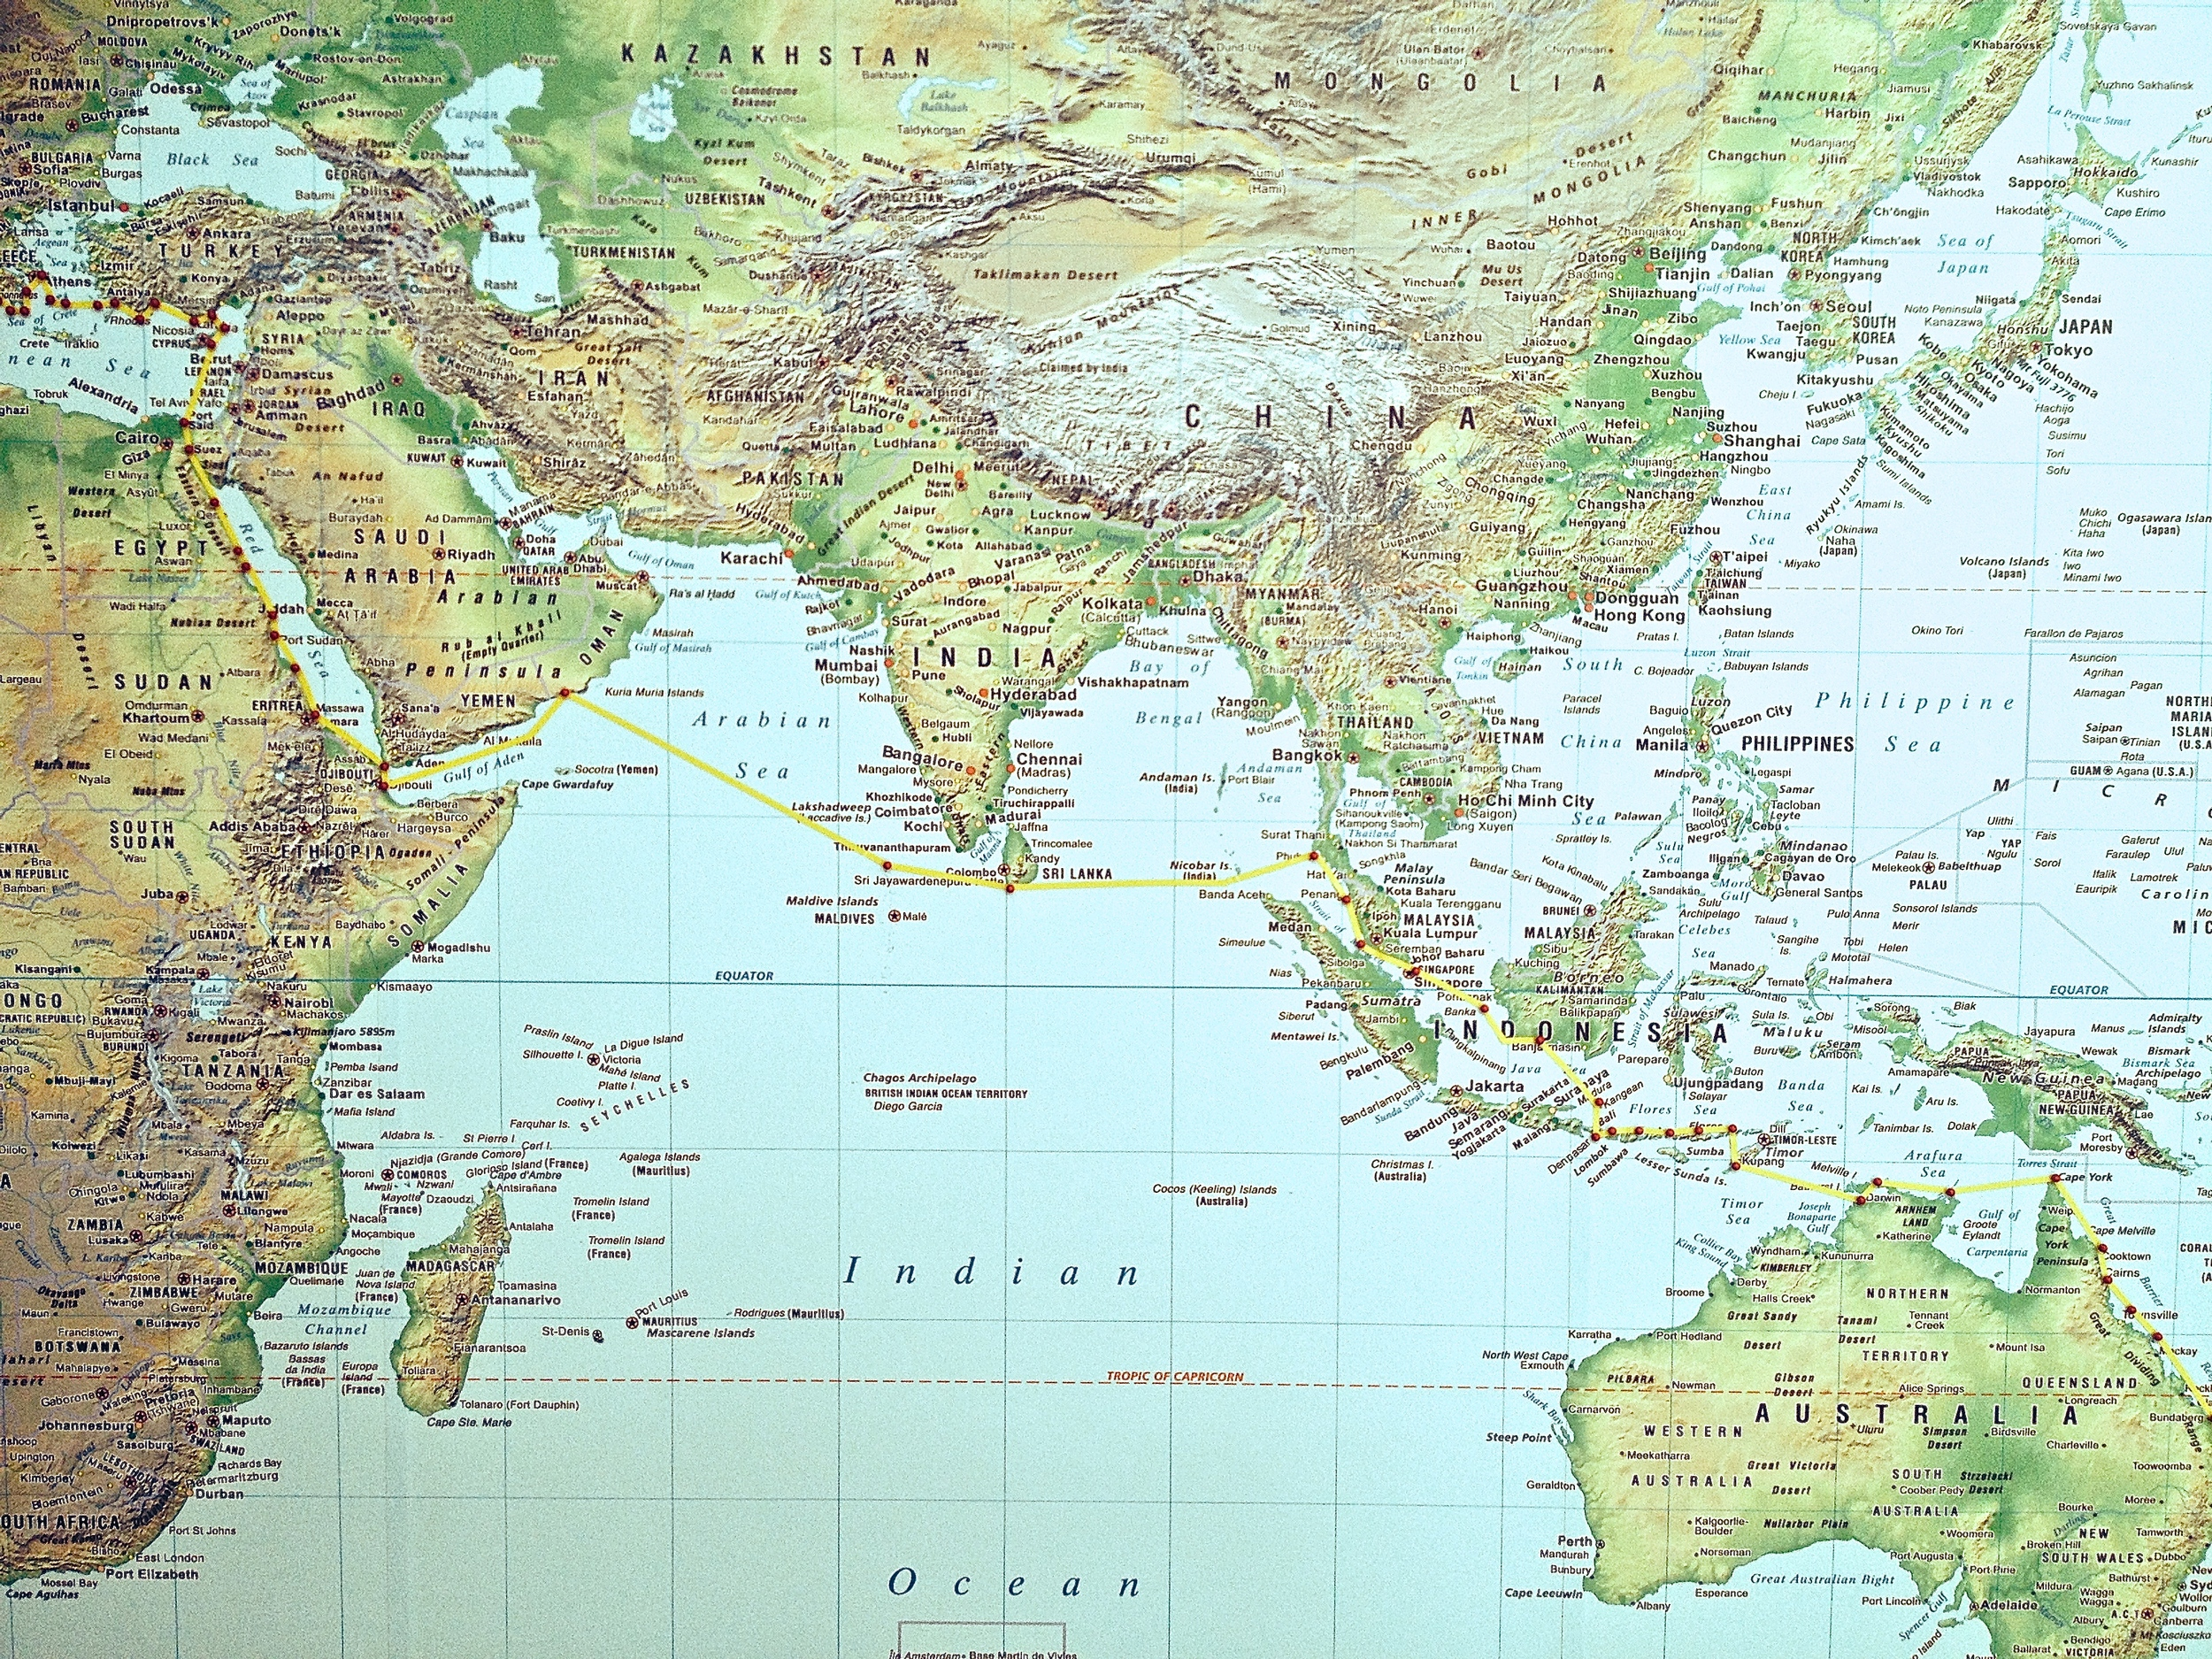 New Zealand toAustralia, Indonesia, Singapore, Malaysia, Thailand, Borneo, Oman, Djibouti, Eritrea, Sudan & Egypt